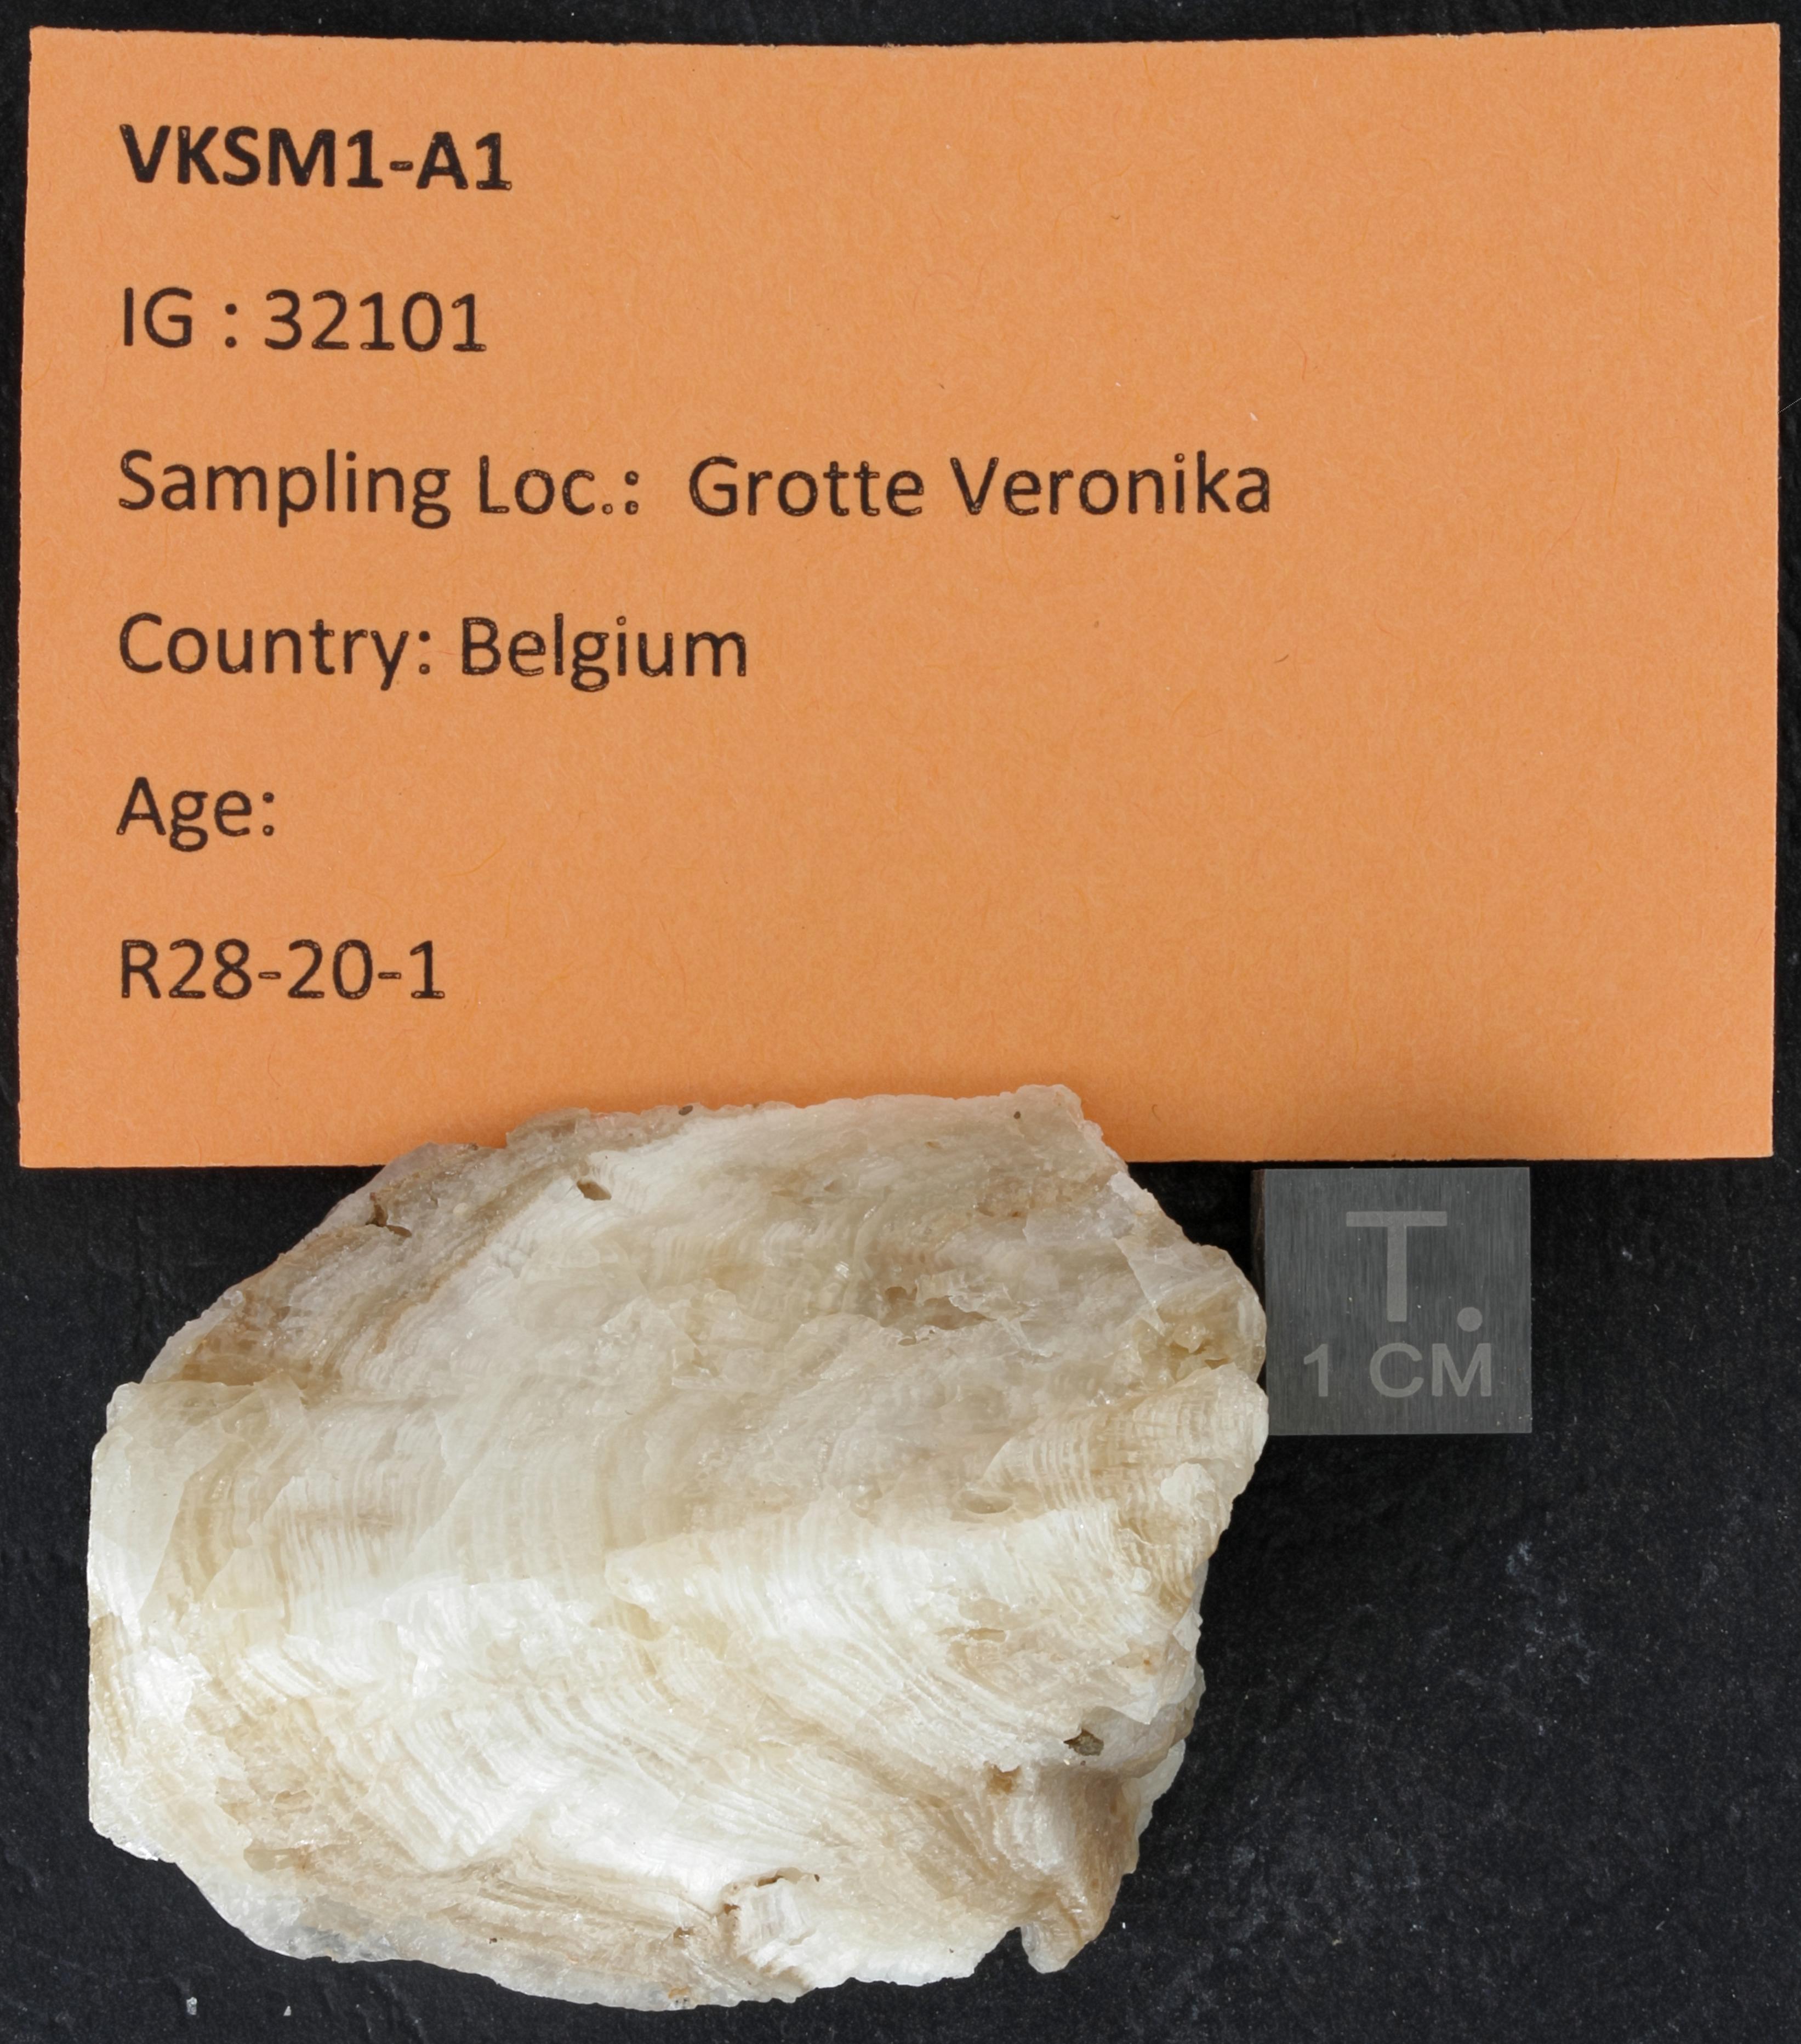 SPELEO-VKSM1-A1 ZS PMax_DxO.jpg